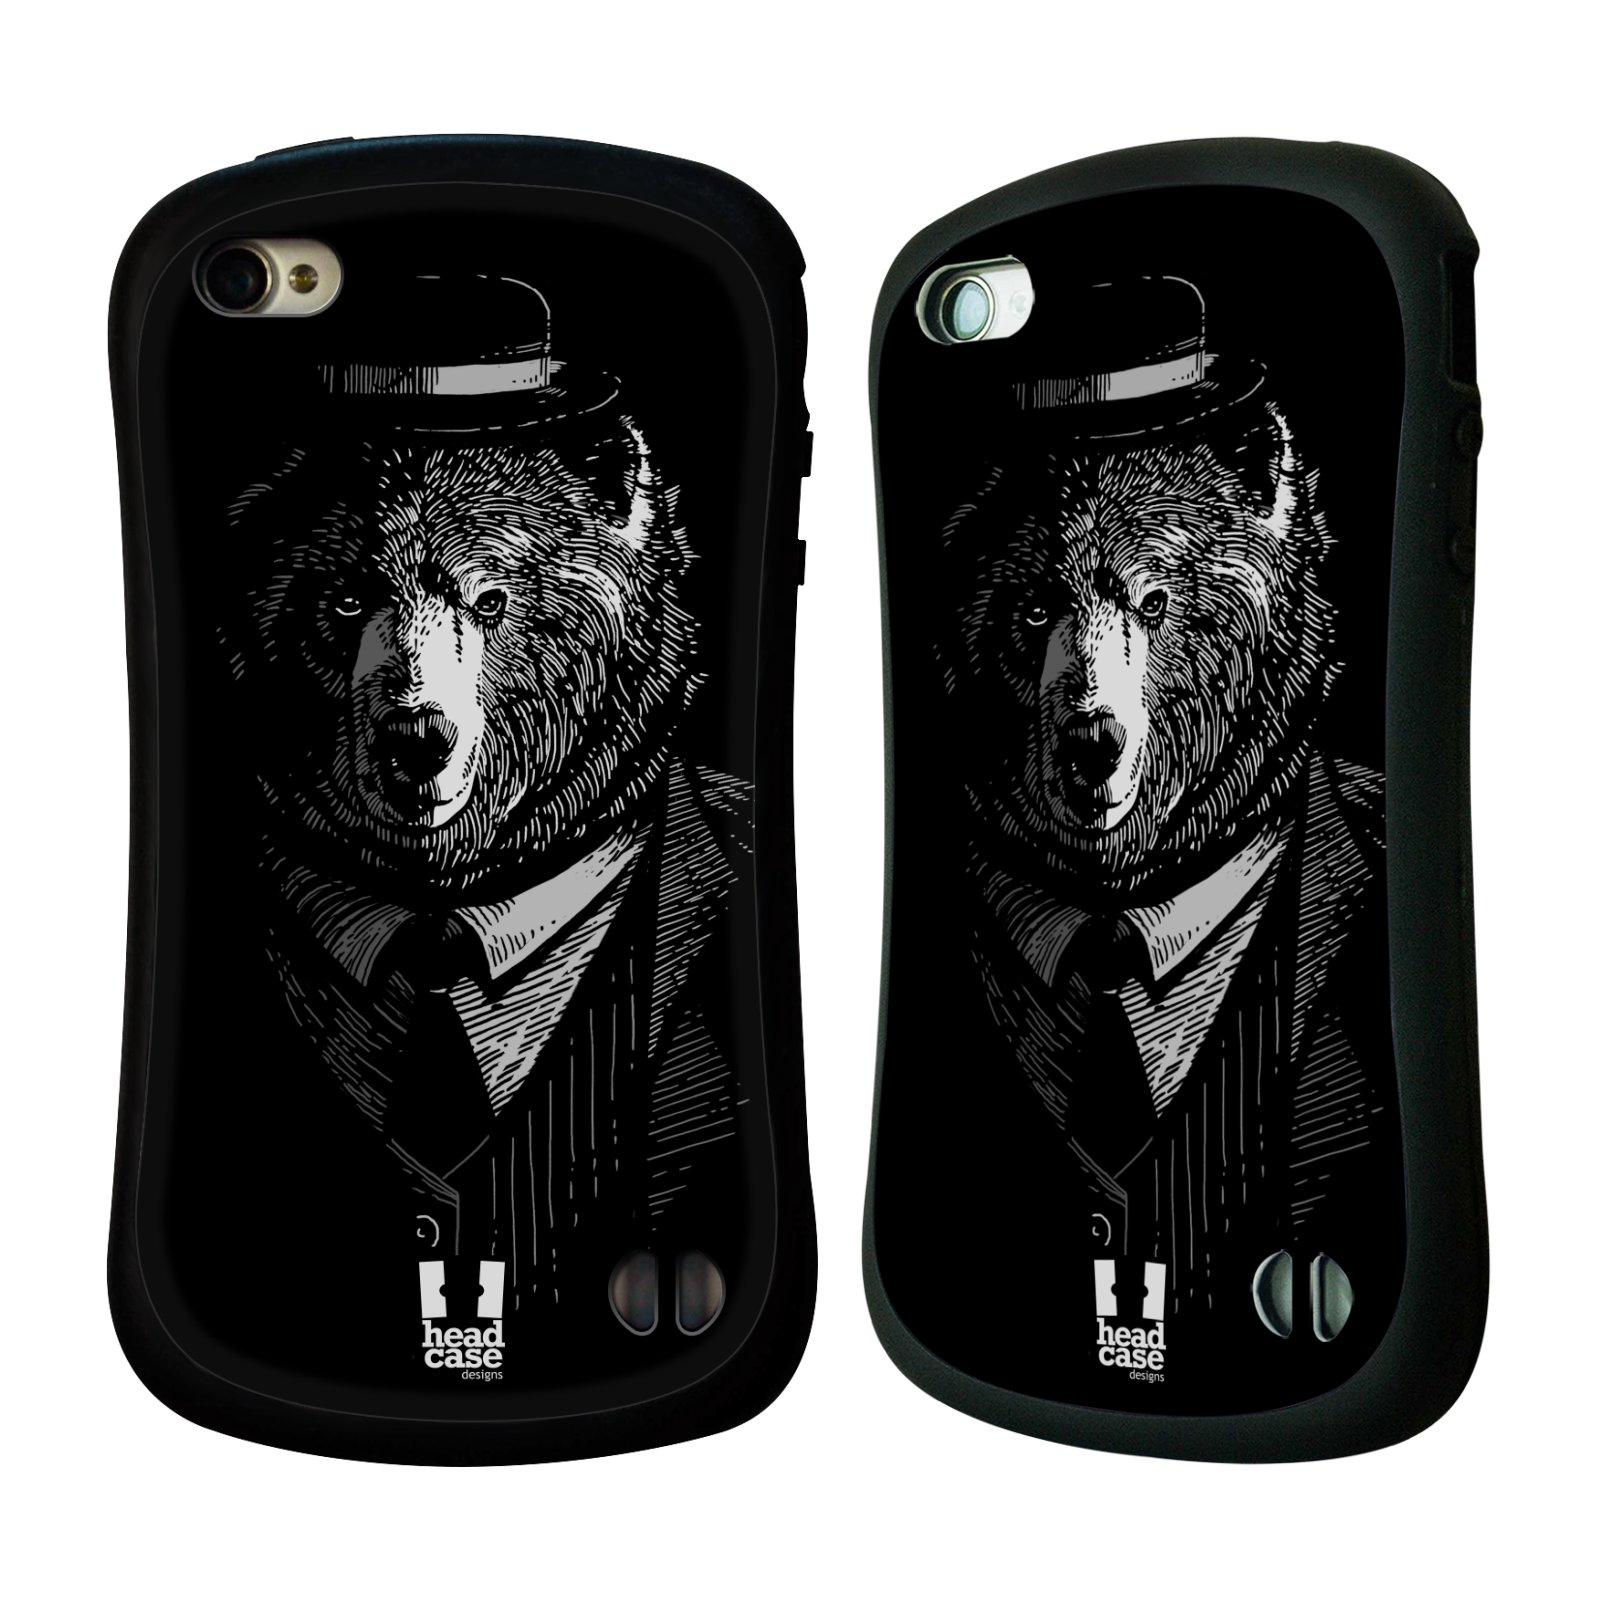 HEAD CASE silikon/plast odolný obal na mobil Apple Iphone 4/4S vzor Zvíře v obleku medvěd